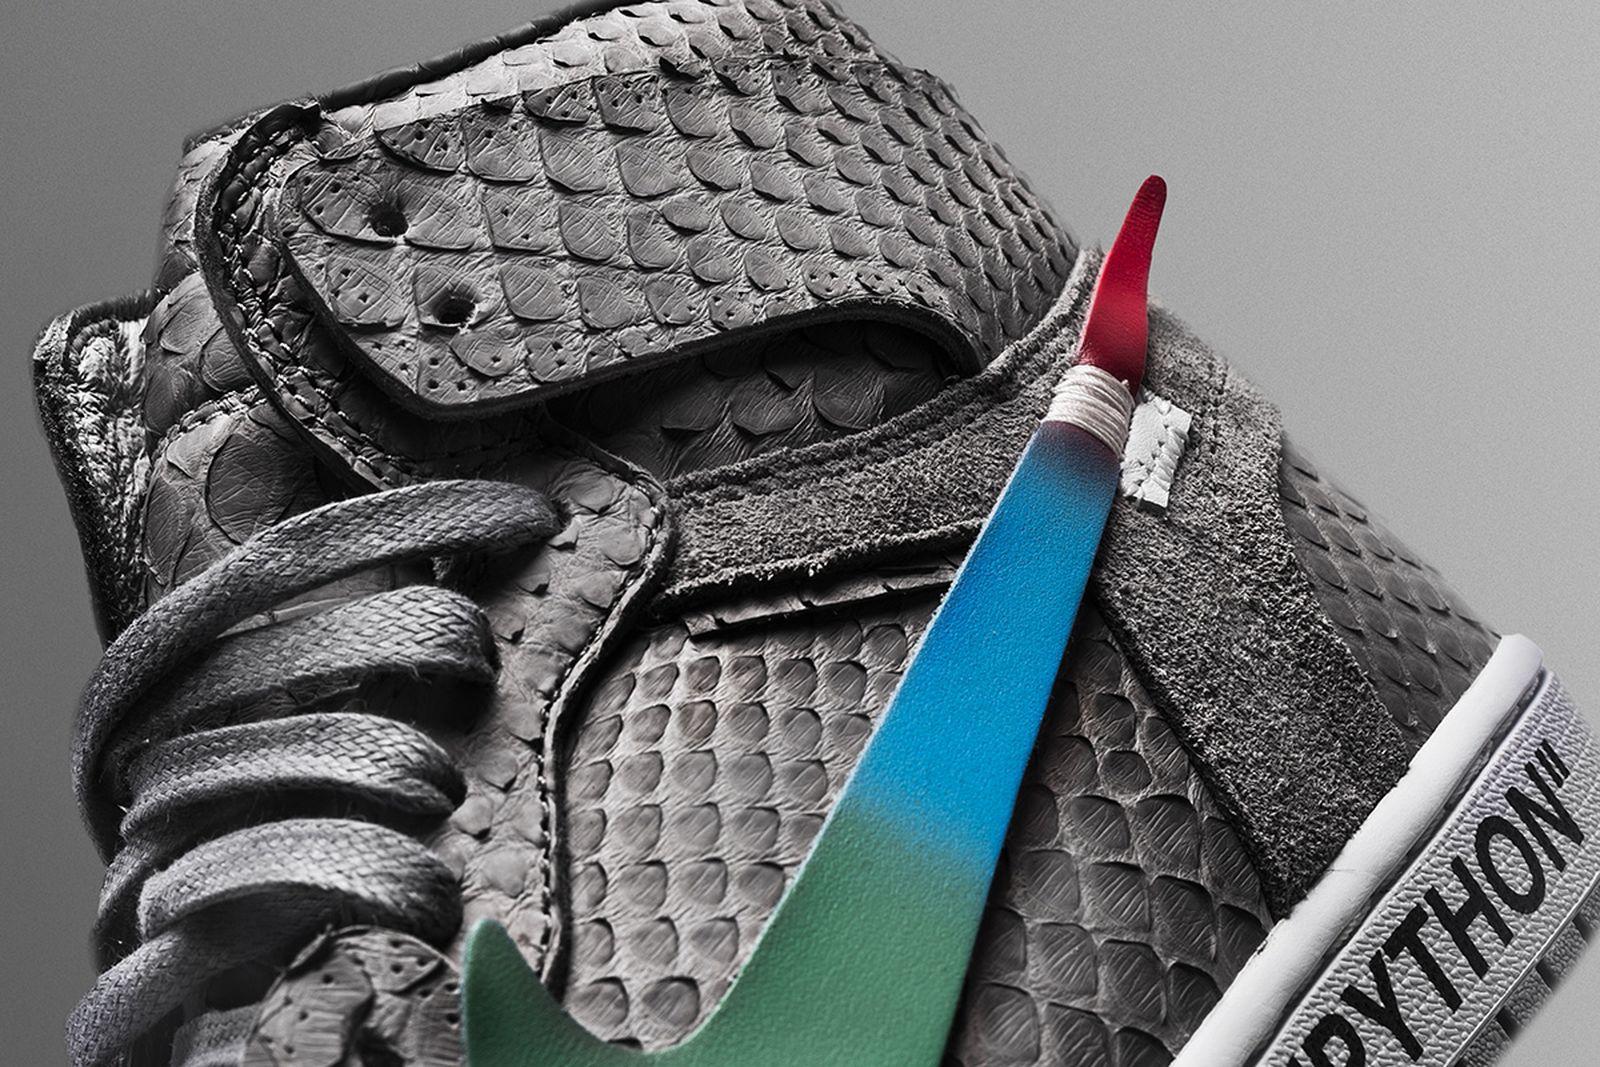 the shoe surgeon nike air jordan 1 menta release date price Dominic Ciambrone jordan brand